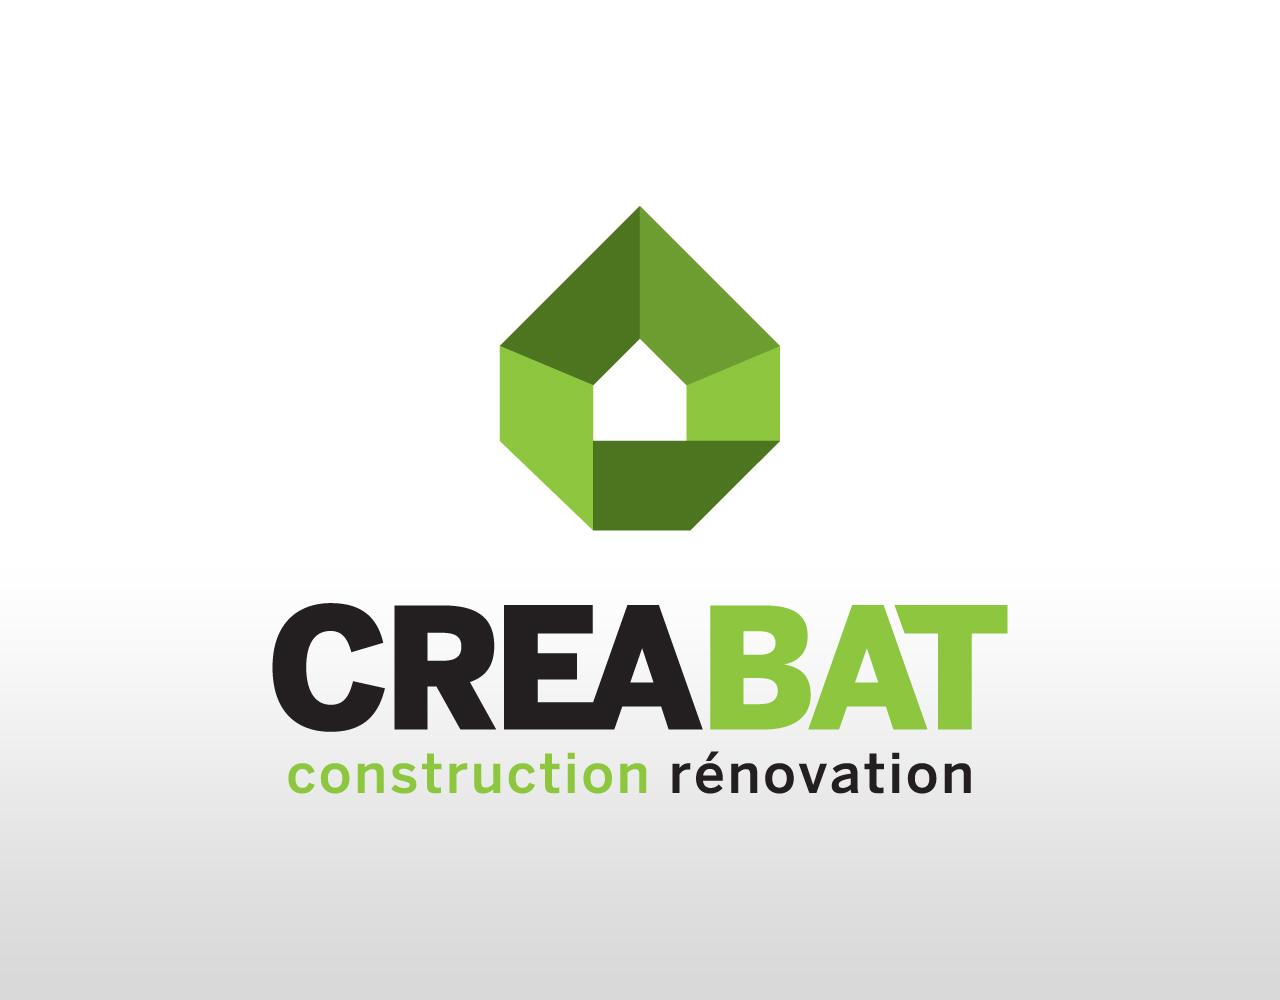 creabat-creation-logo-charte-graphique-identite-visuelle-caconcept-alexis-cretin